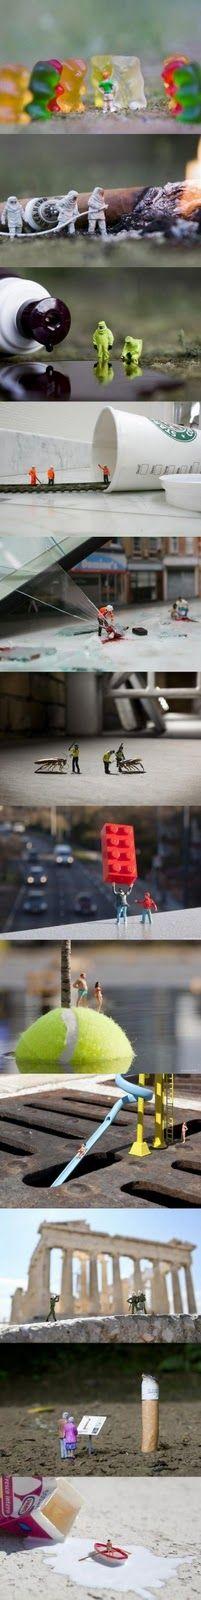 tiny people:) Miniature diorama